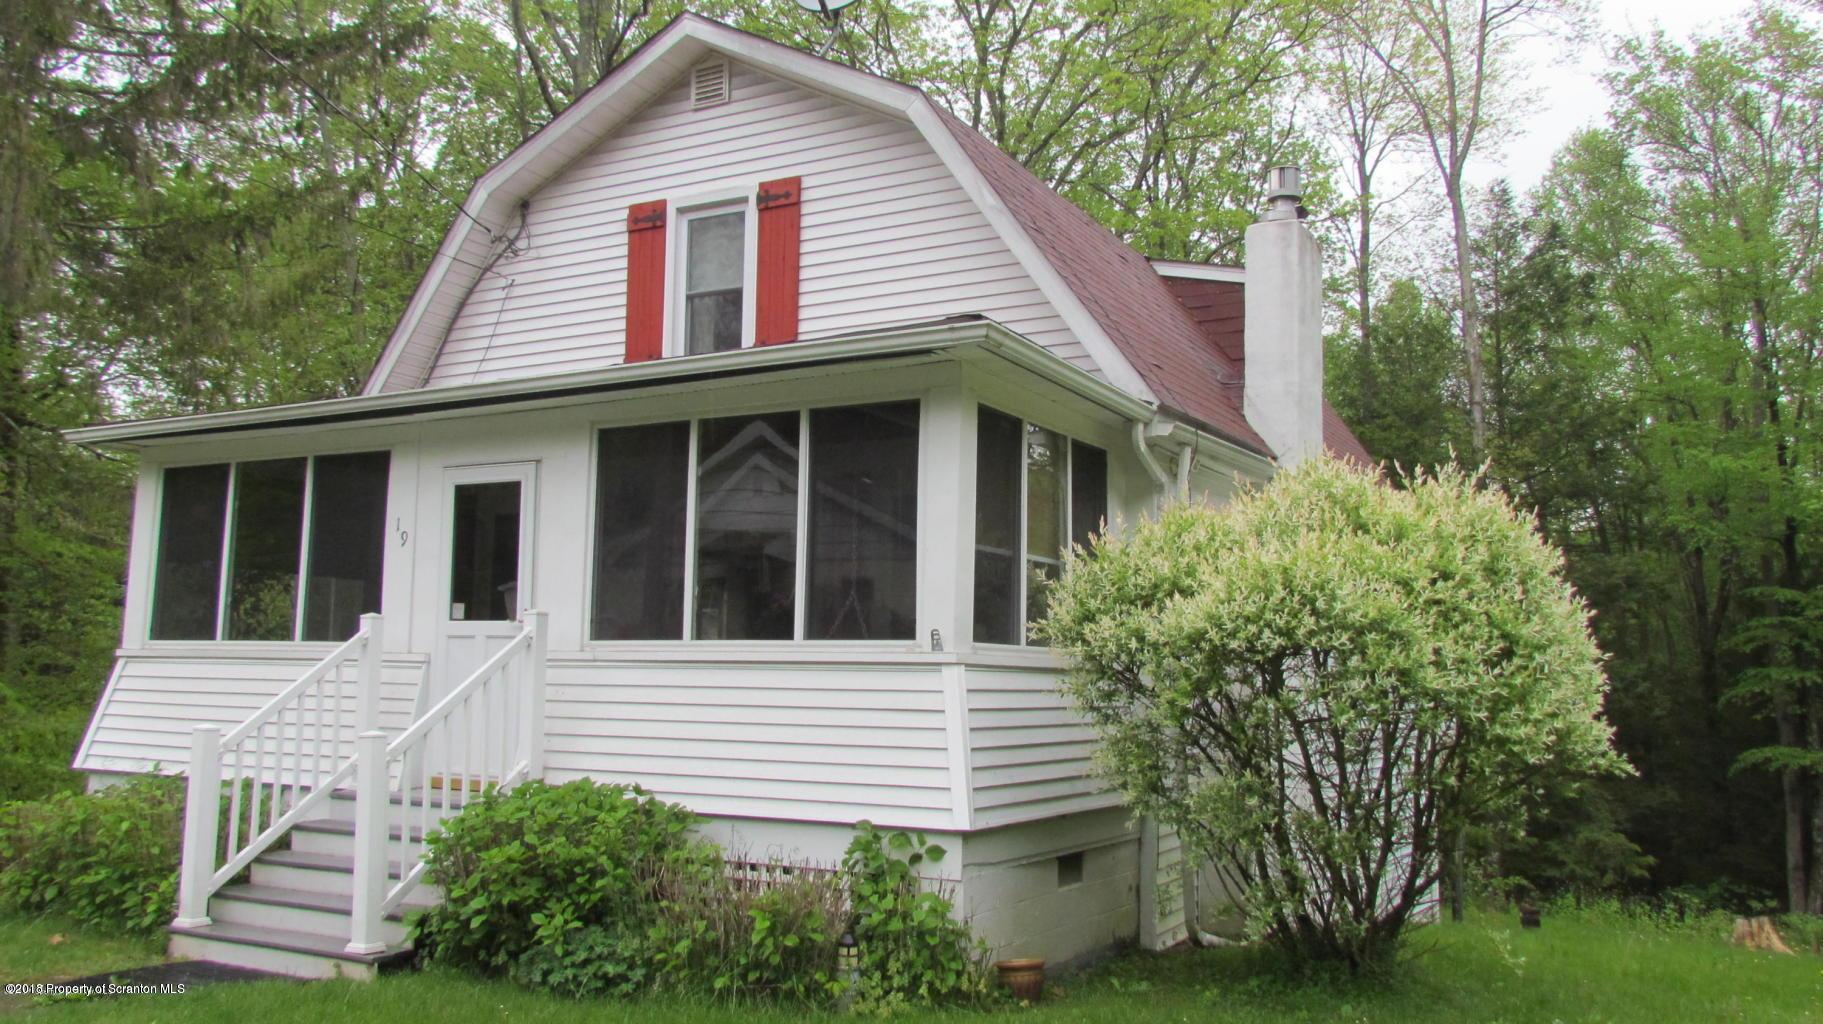 19 Holbrook Rd, Tunkhannock, Pennsylvania